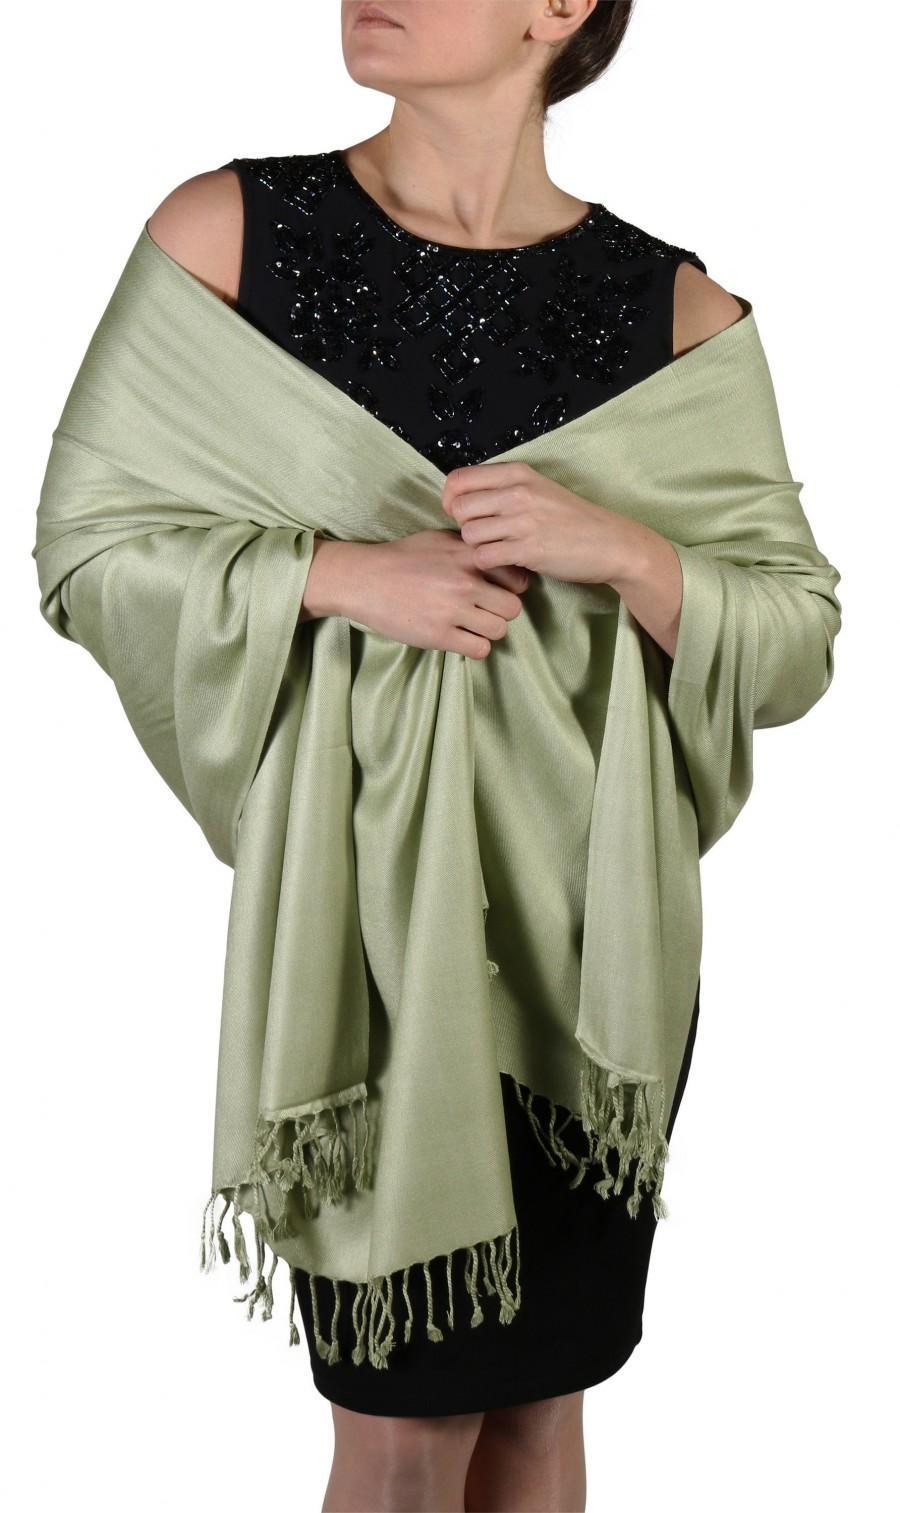 زفاف - Sage Green Pashmina, Shawls And Wraps, Green Wedding Shawl Bridal Cover Up, Pashmina Green Bridesmaid Shawl Sage Accessories, Gift For Women